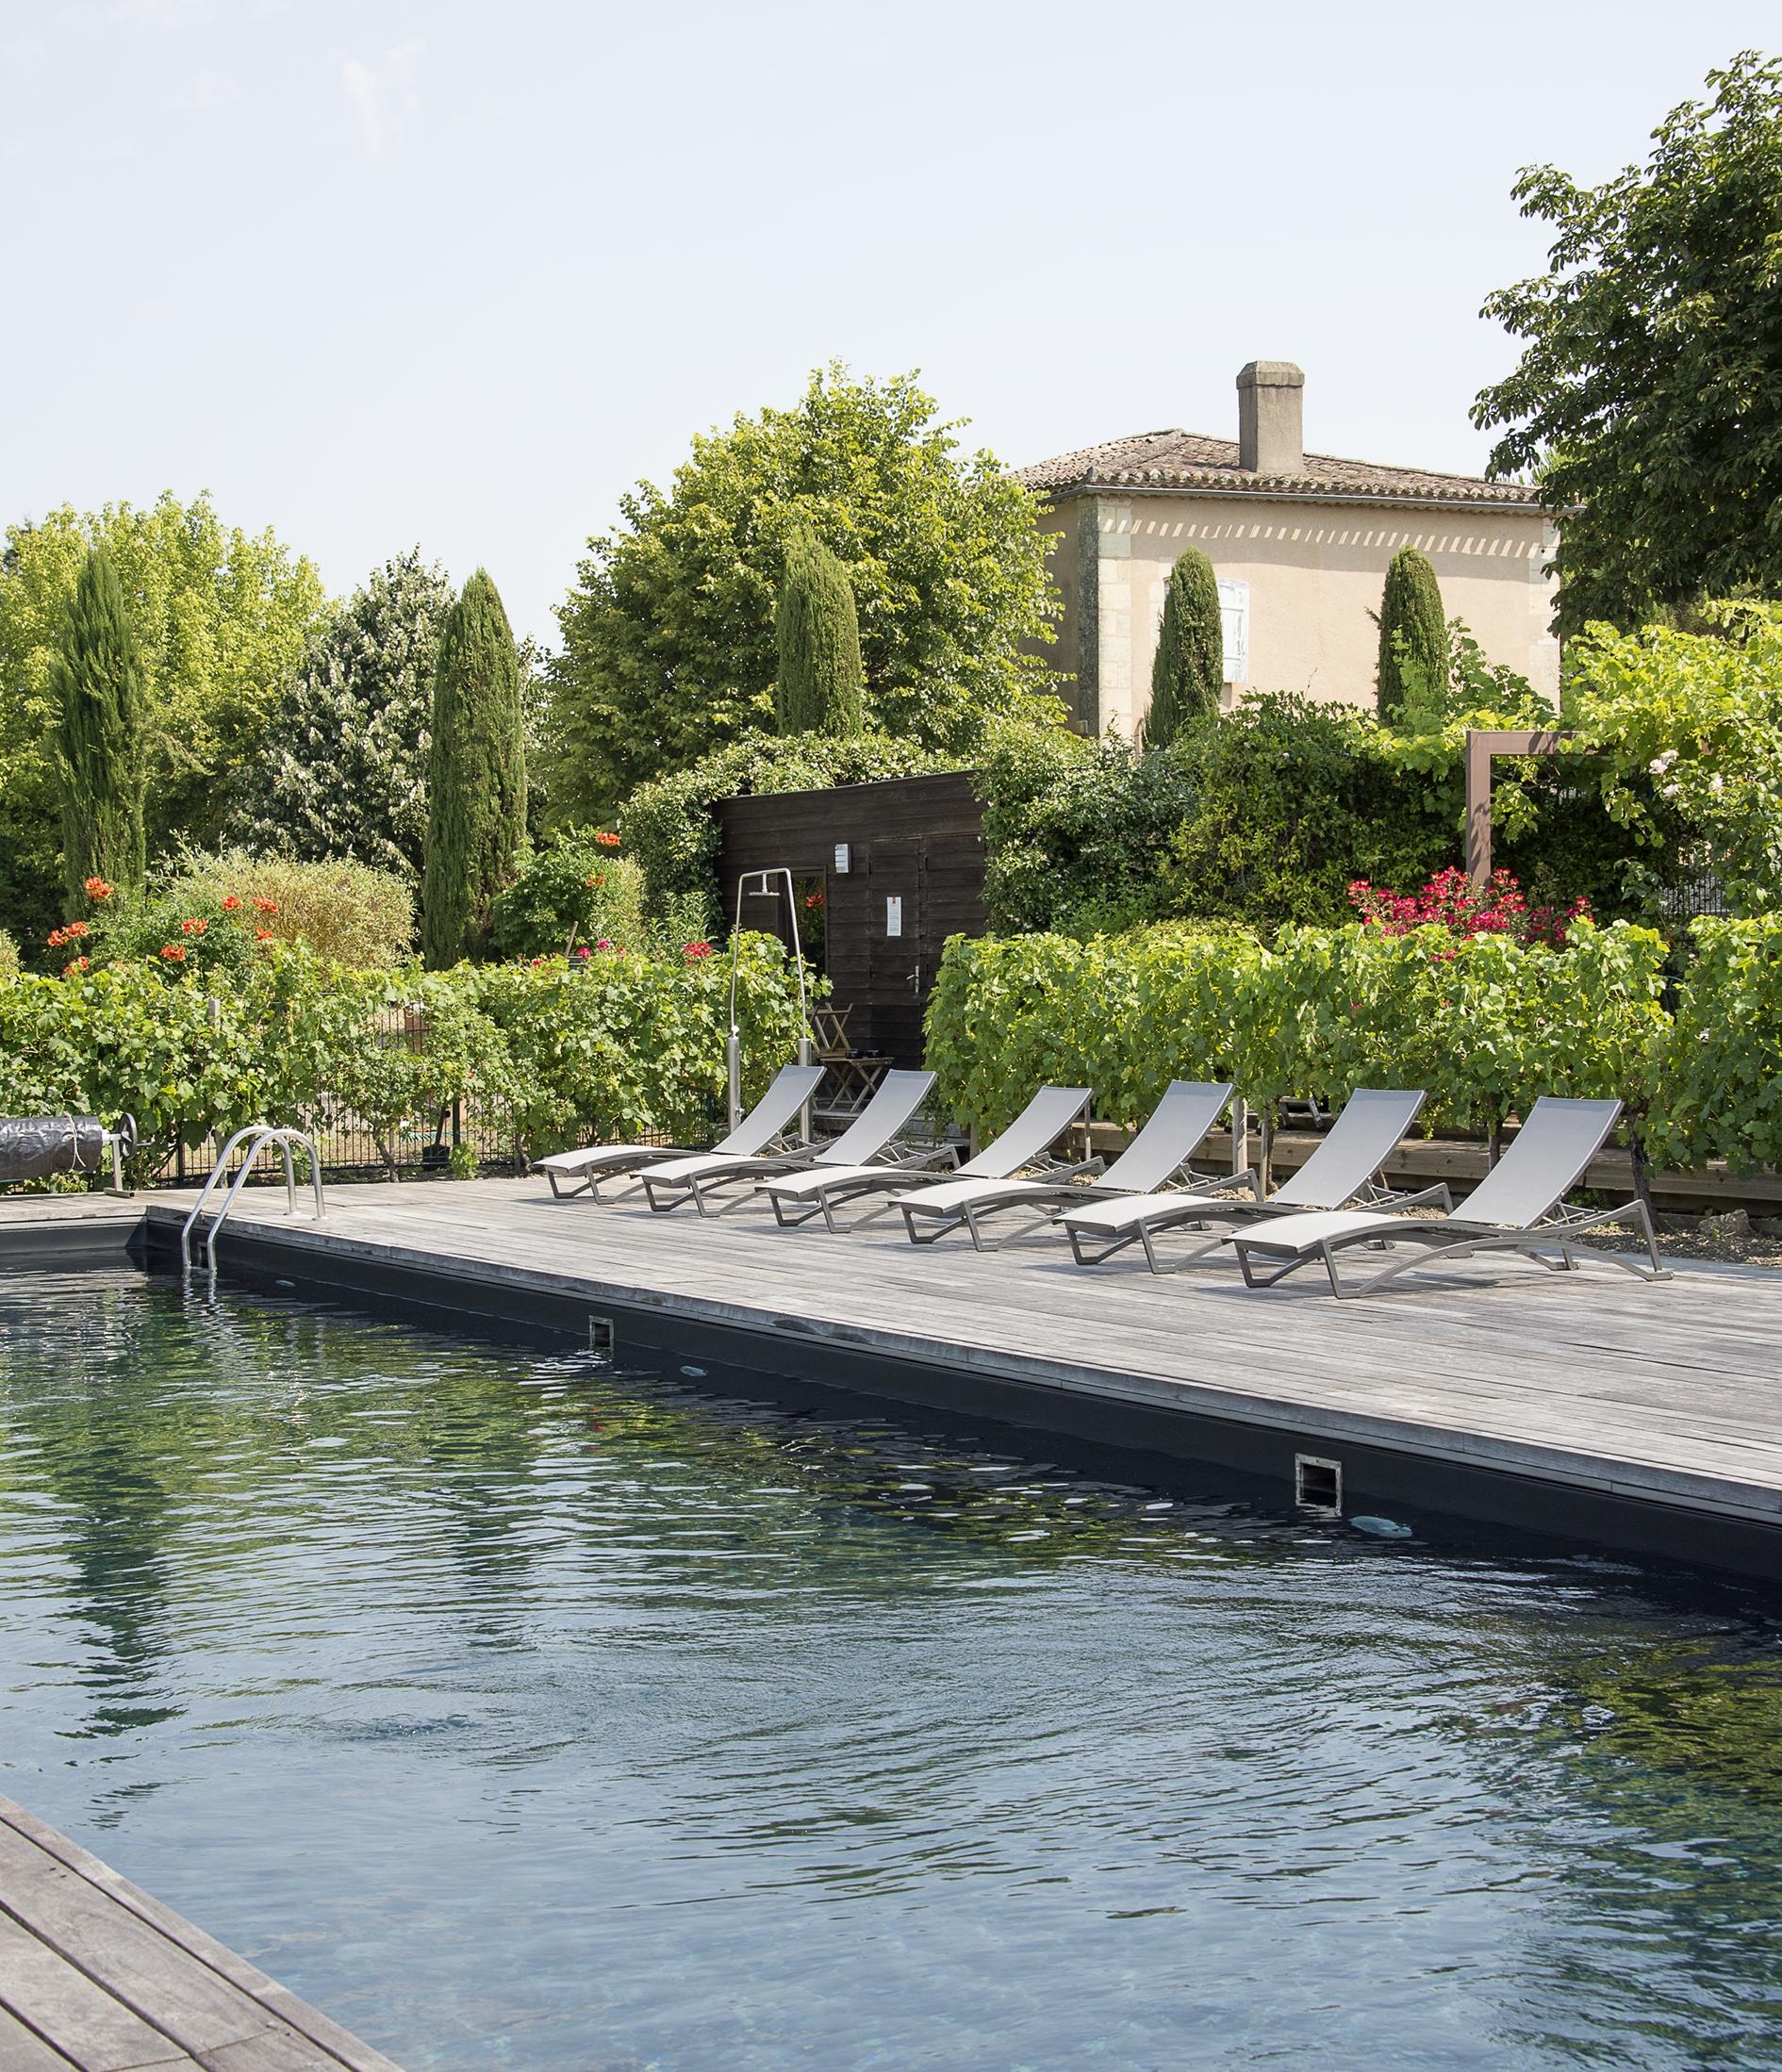 hotel-stj-piscine-droits-veronique-vedrenne